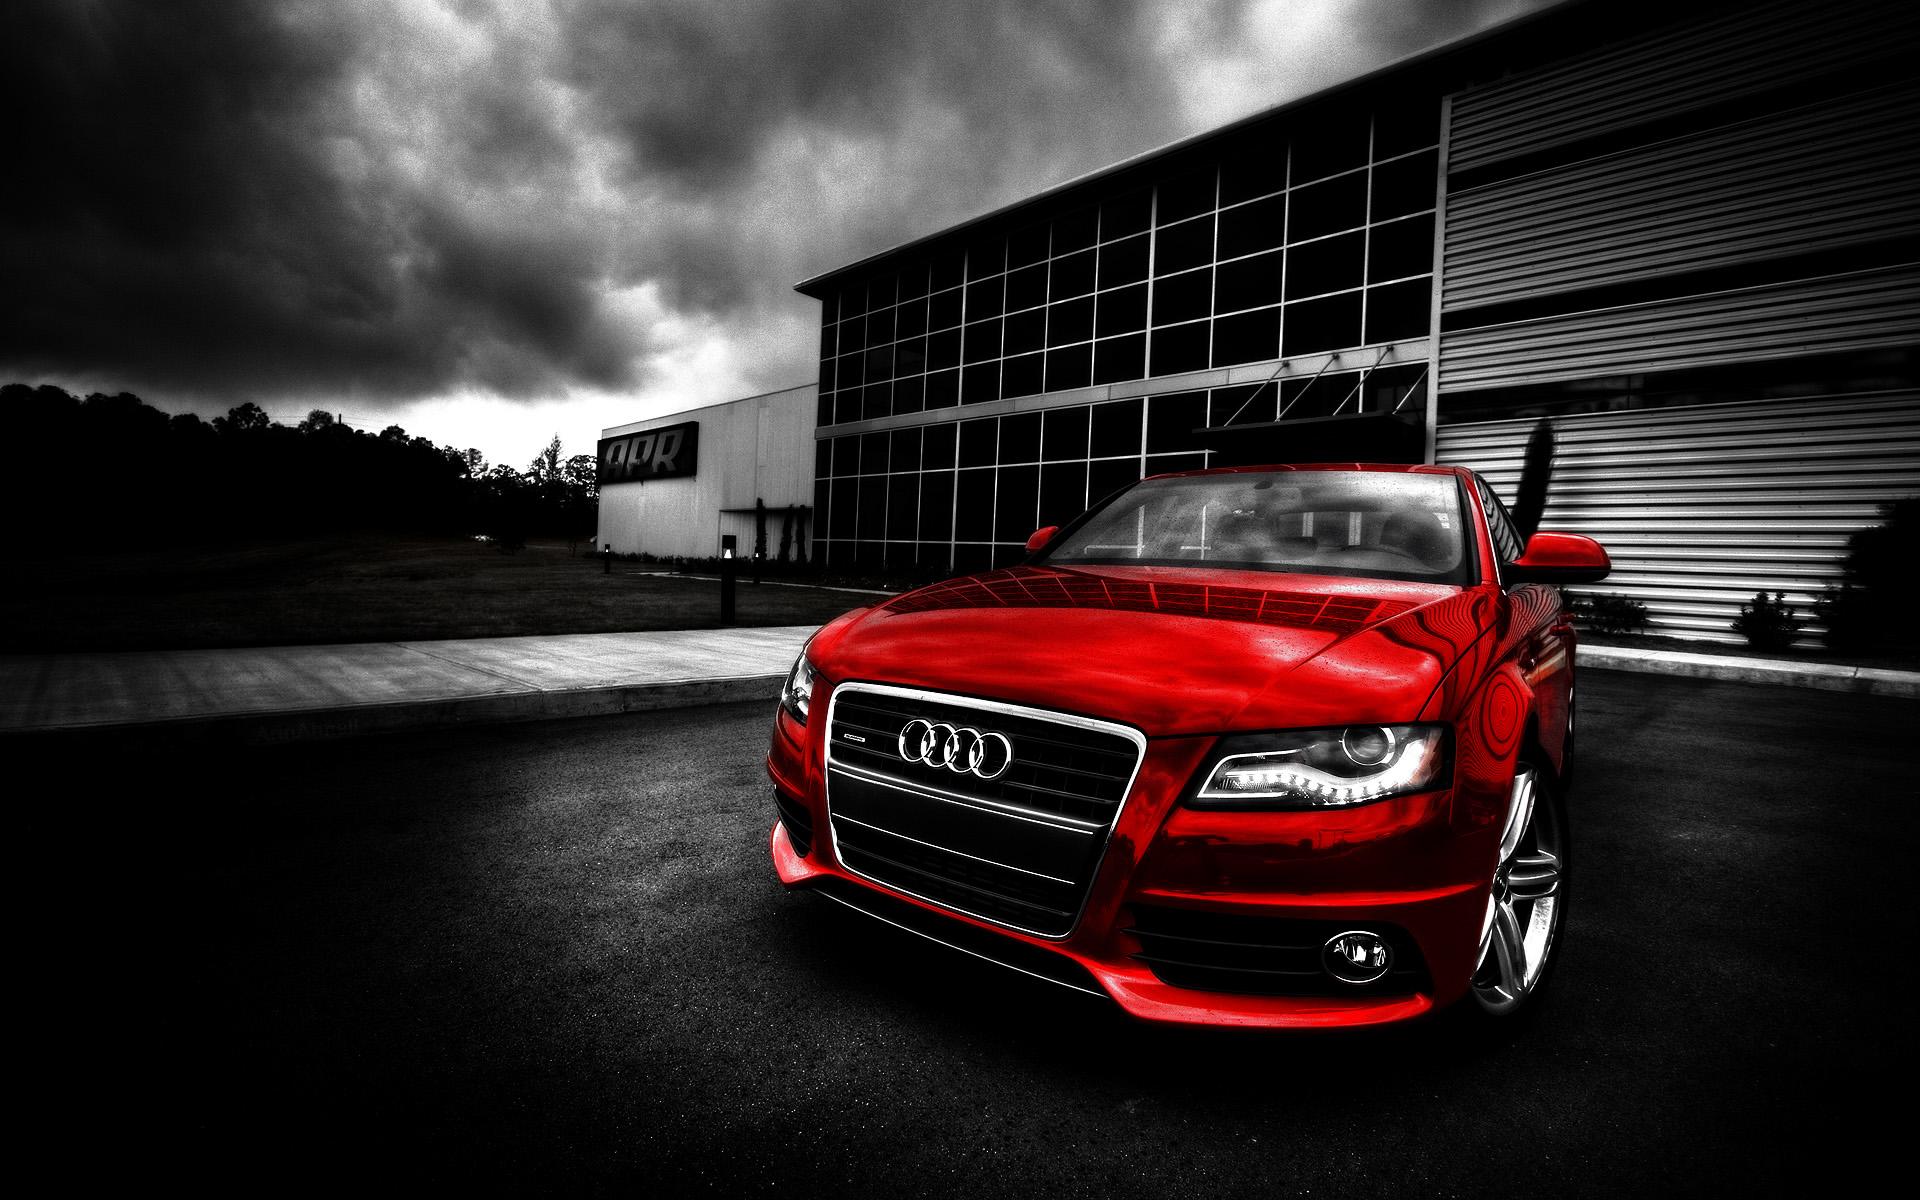 Audi Wallpaper Hd (58 Wallpapers) - Adorable Wallpapers